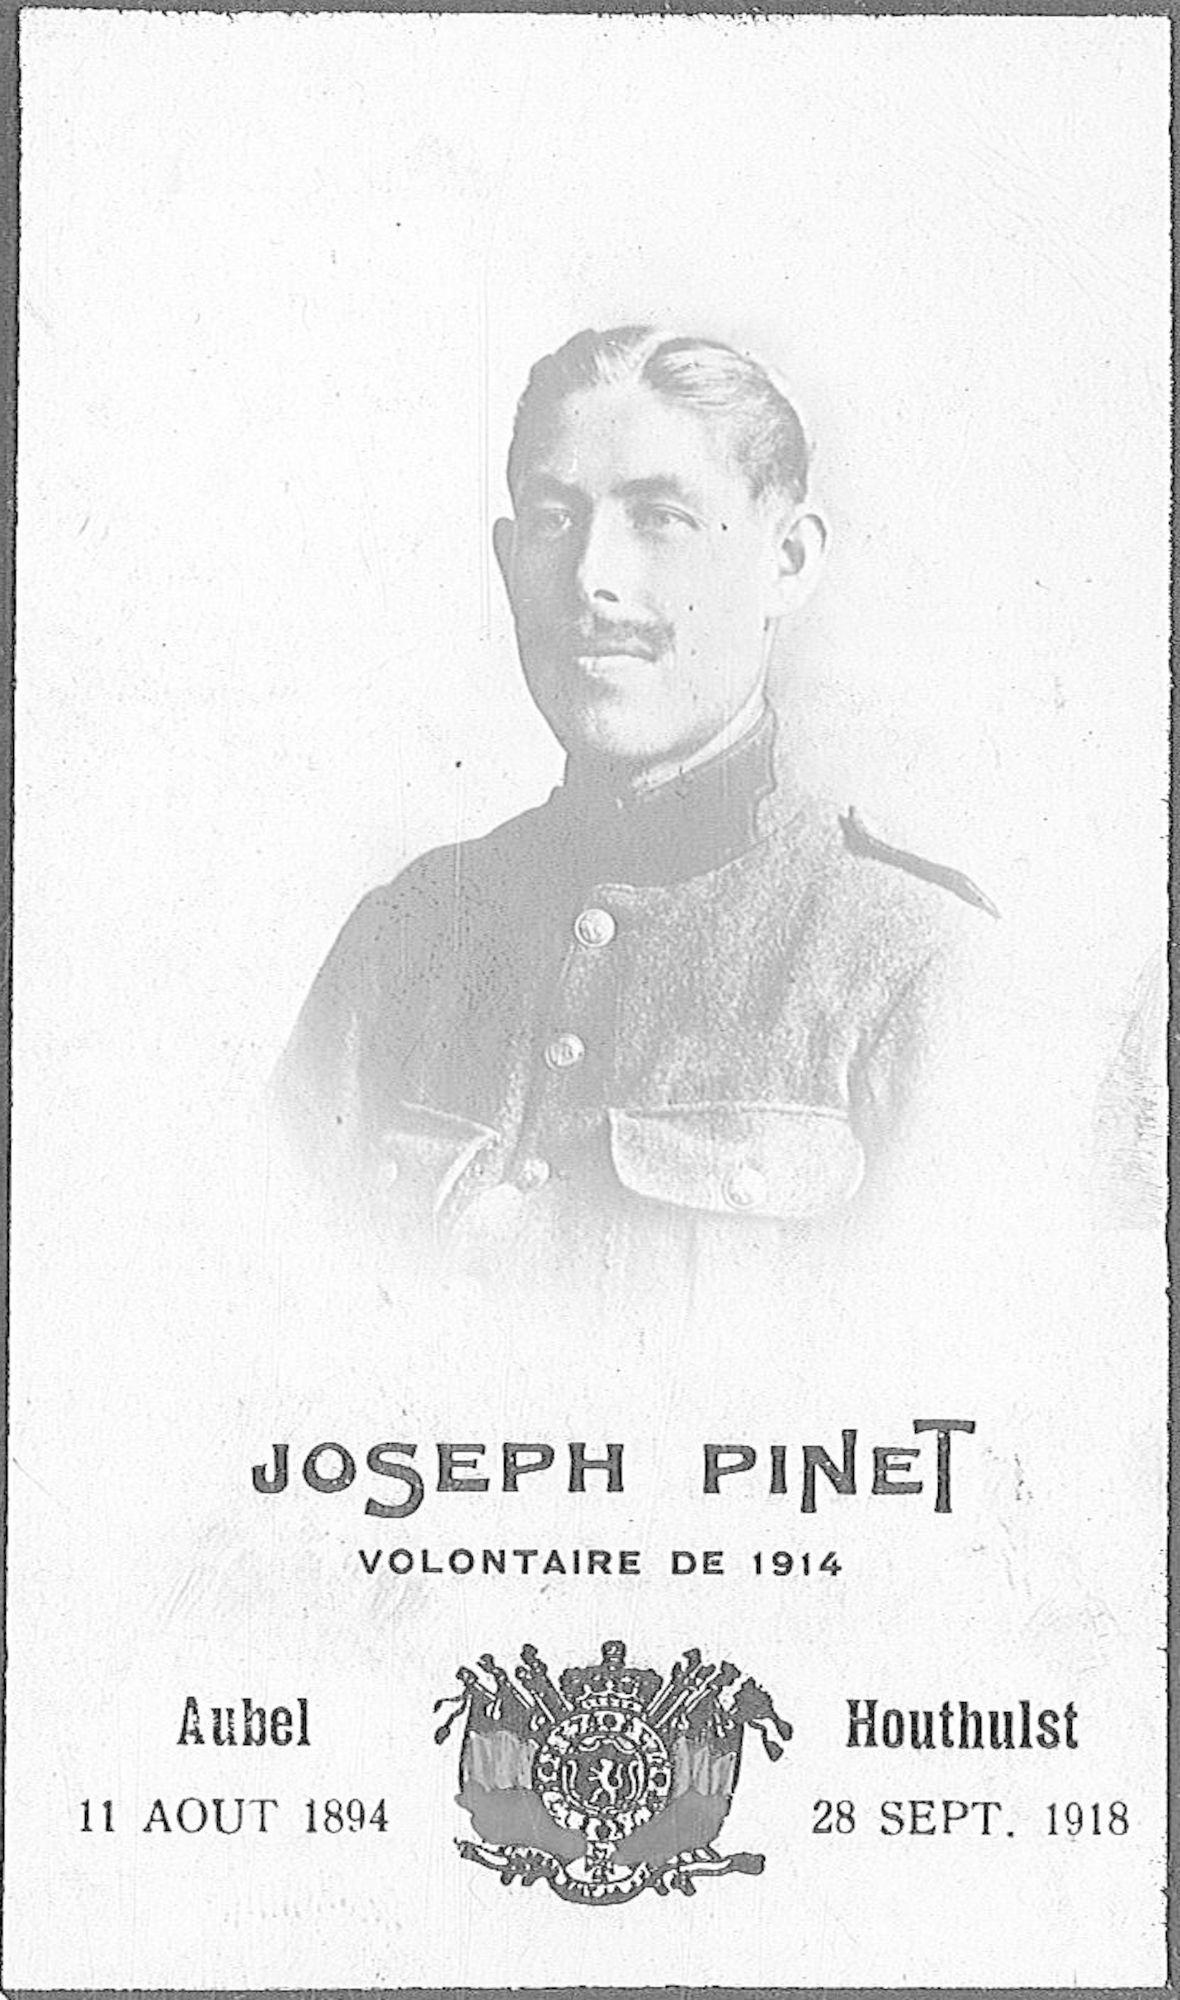 Pinet Joseph